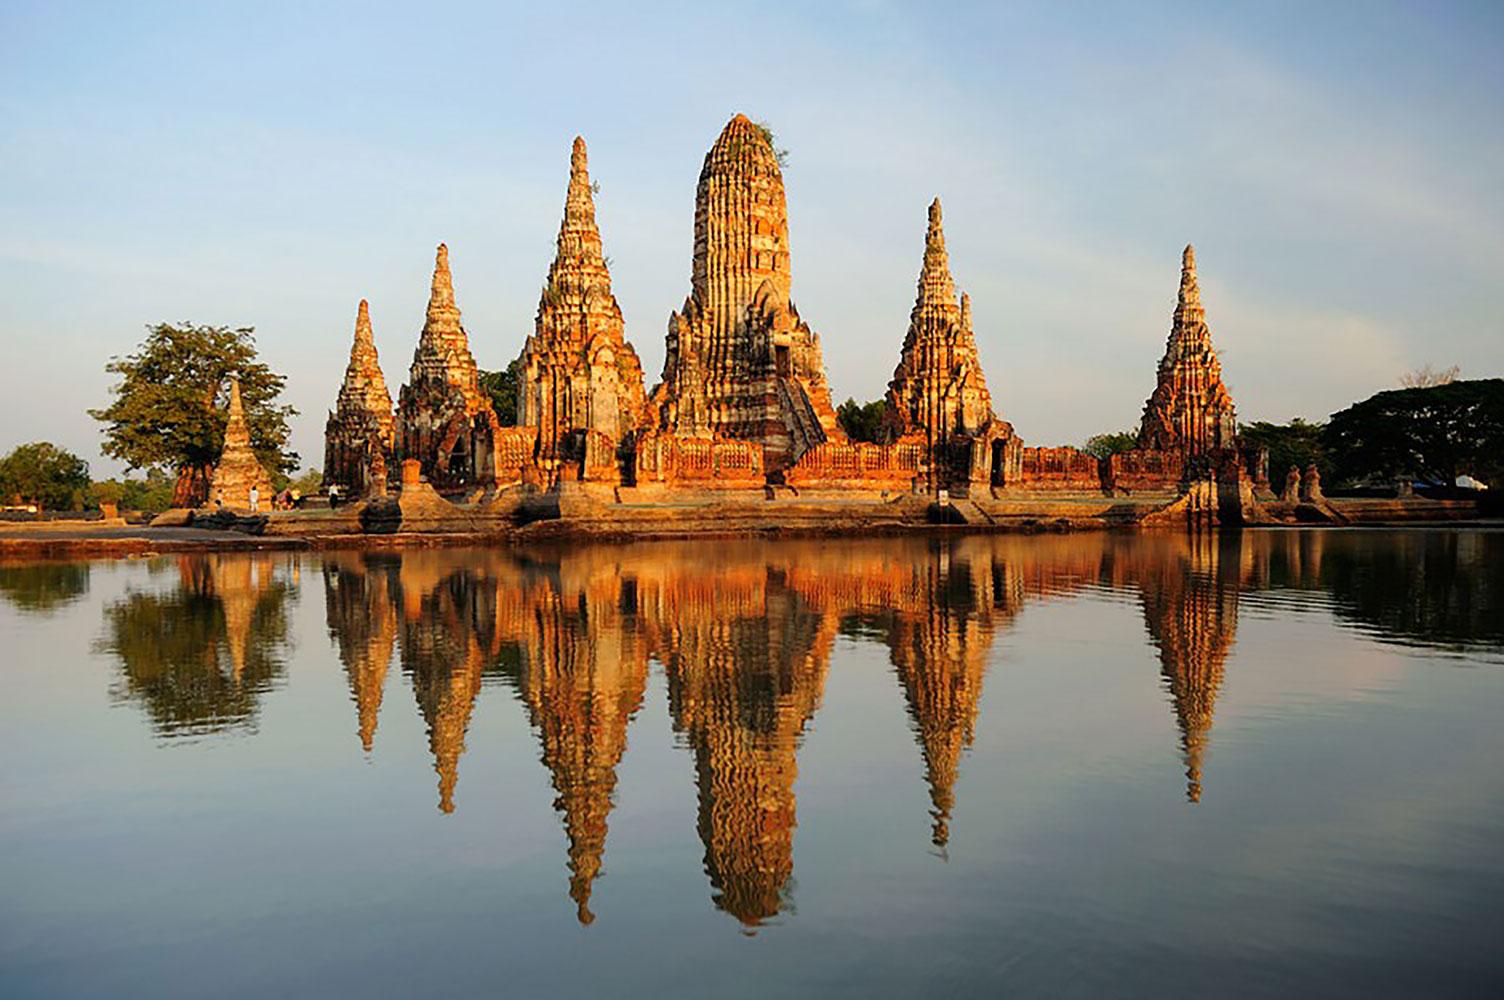 Temple lake filming location in Bangkok Thailand